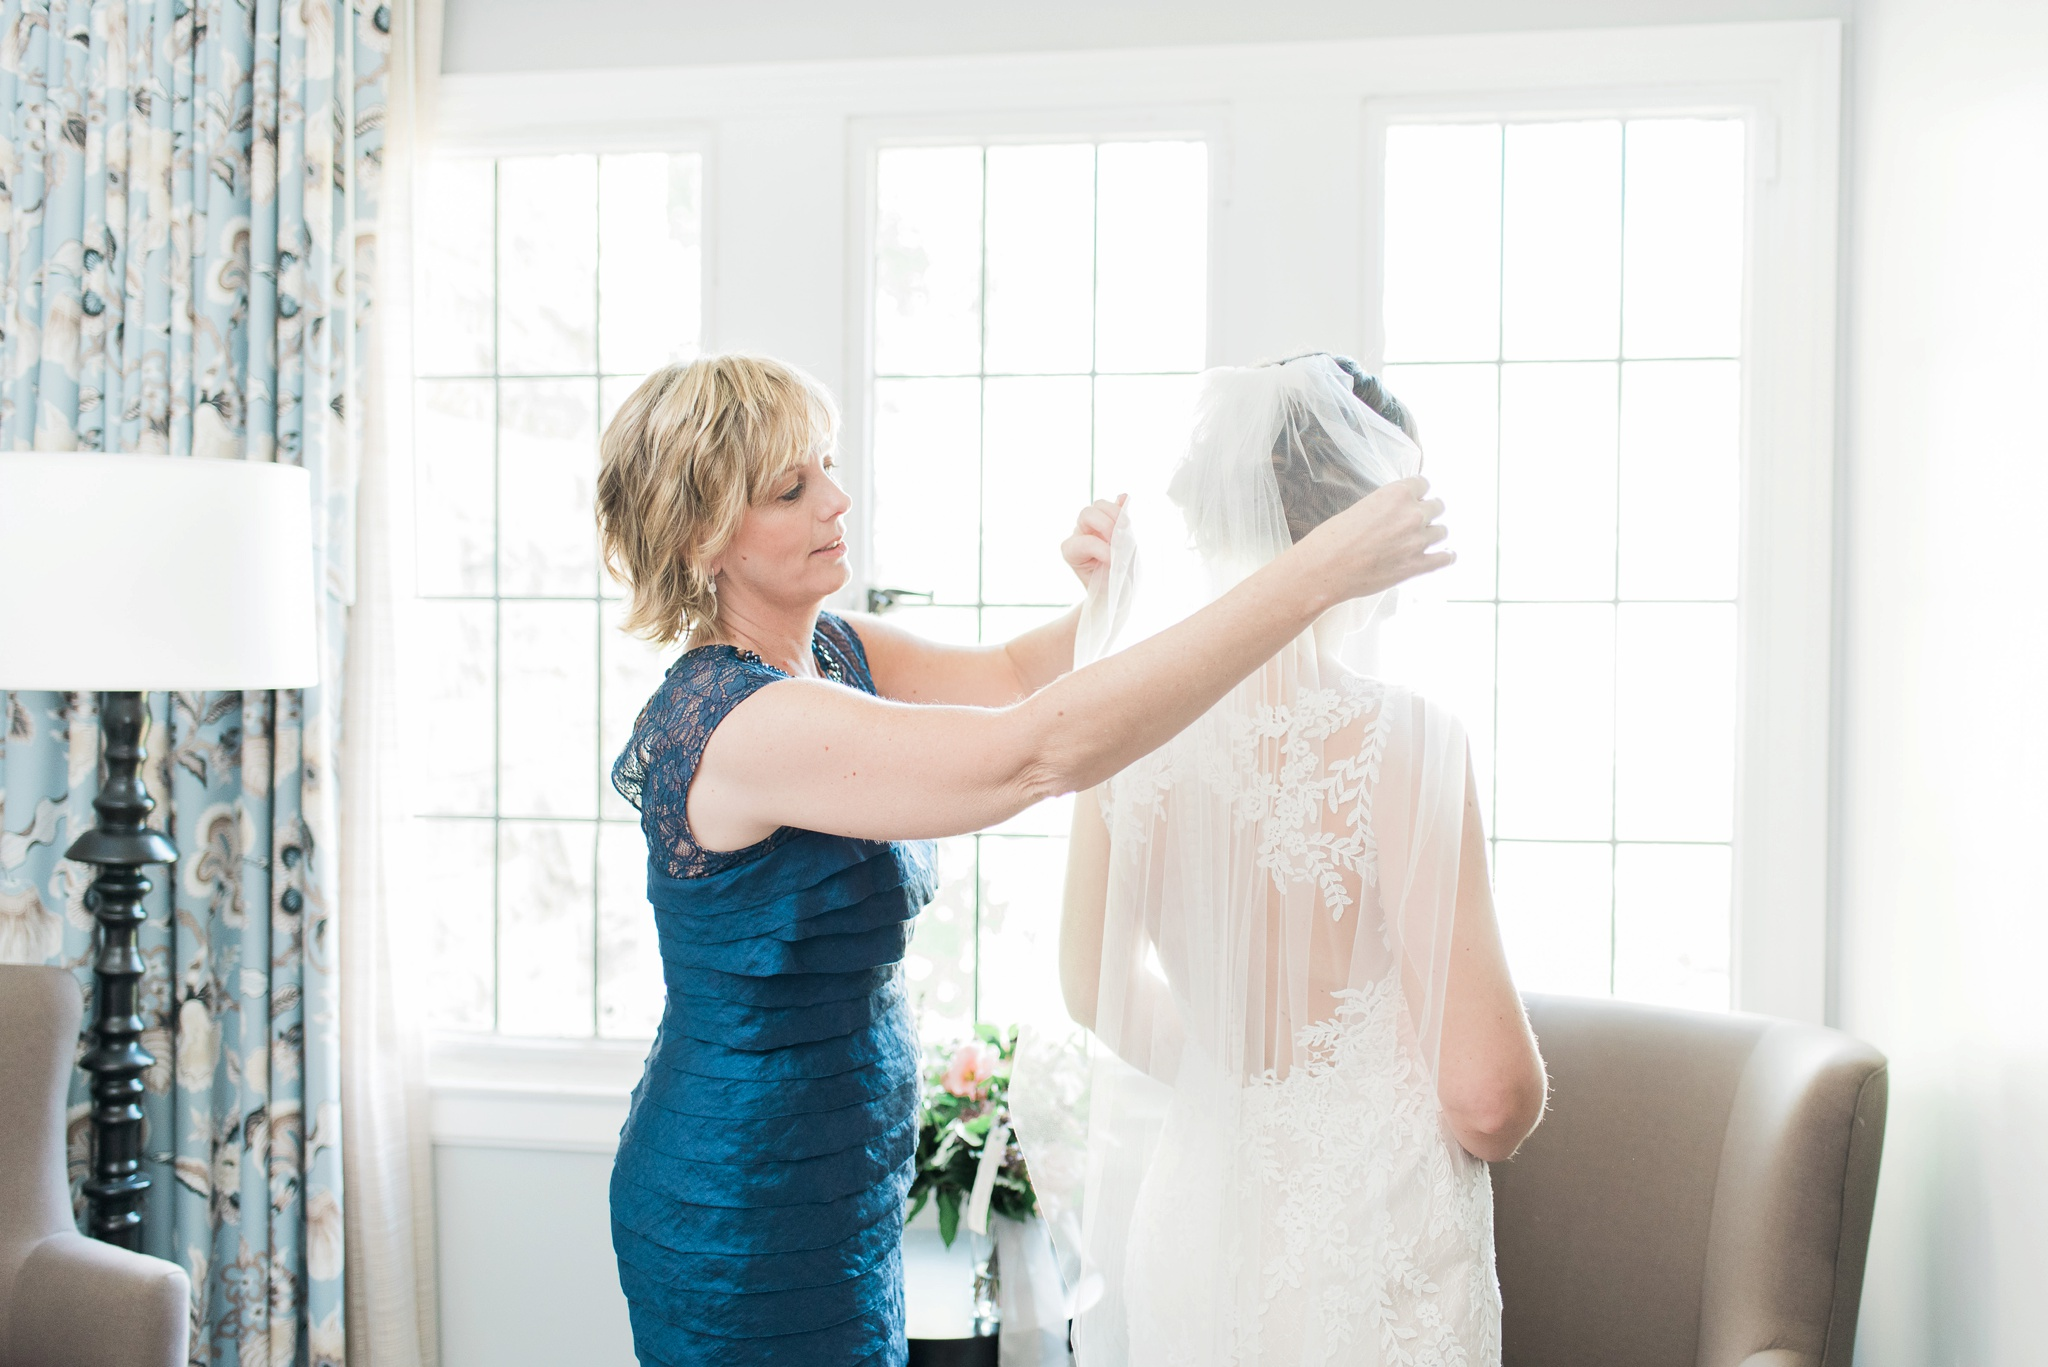 granville-inn-wedding-columbus-ohio-photographer_0014.jpg